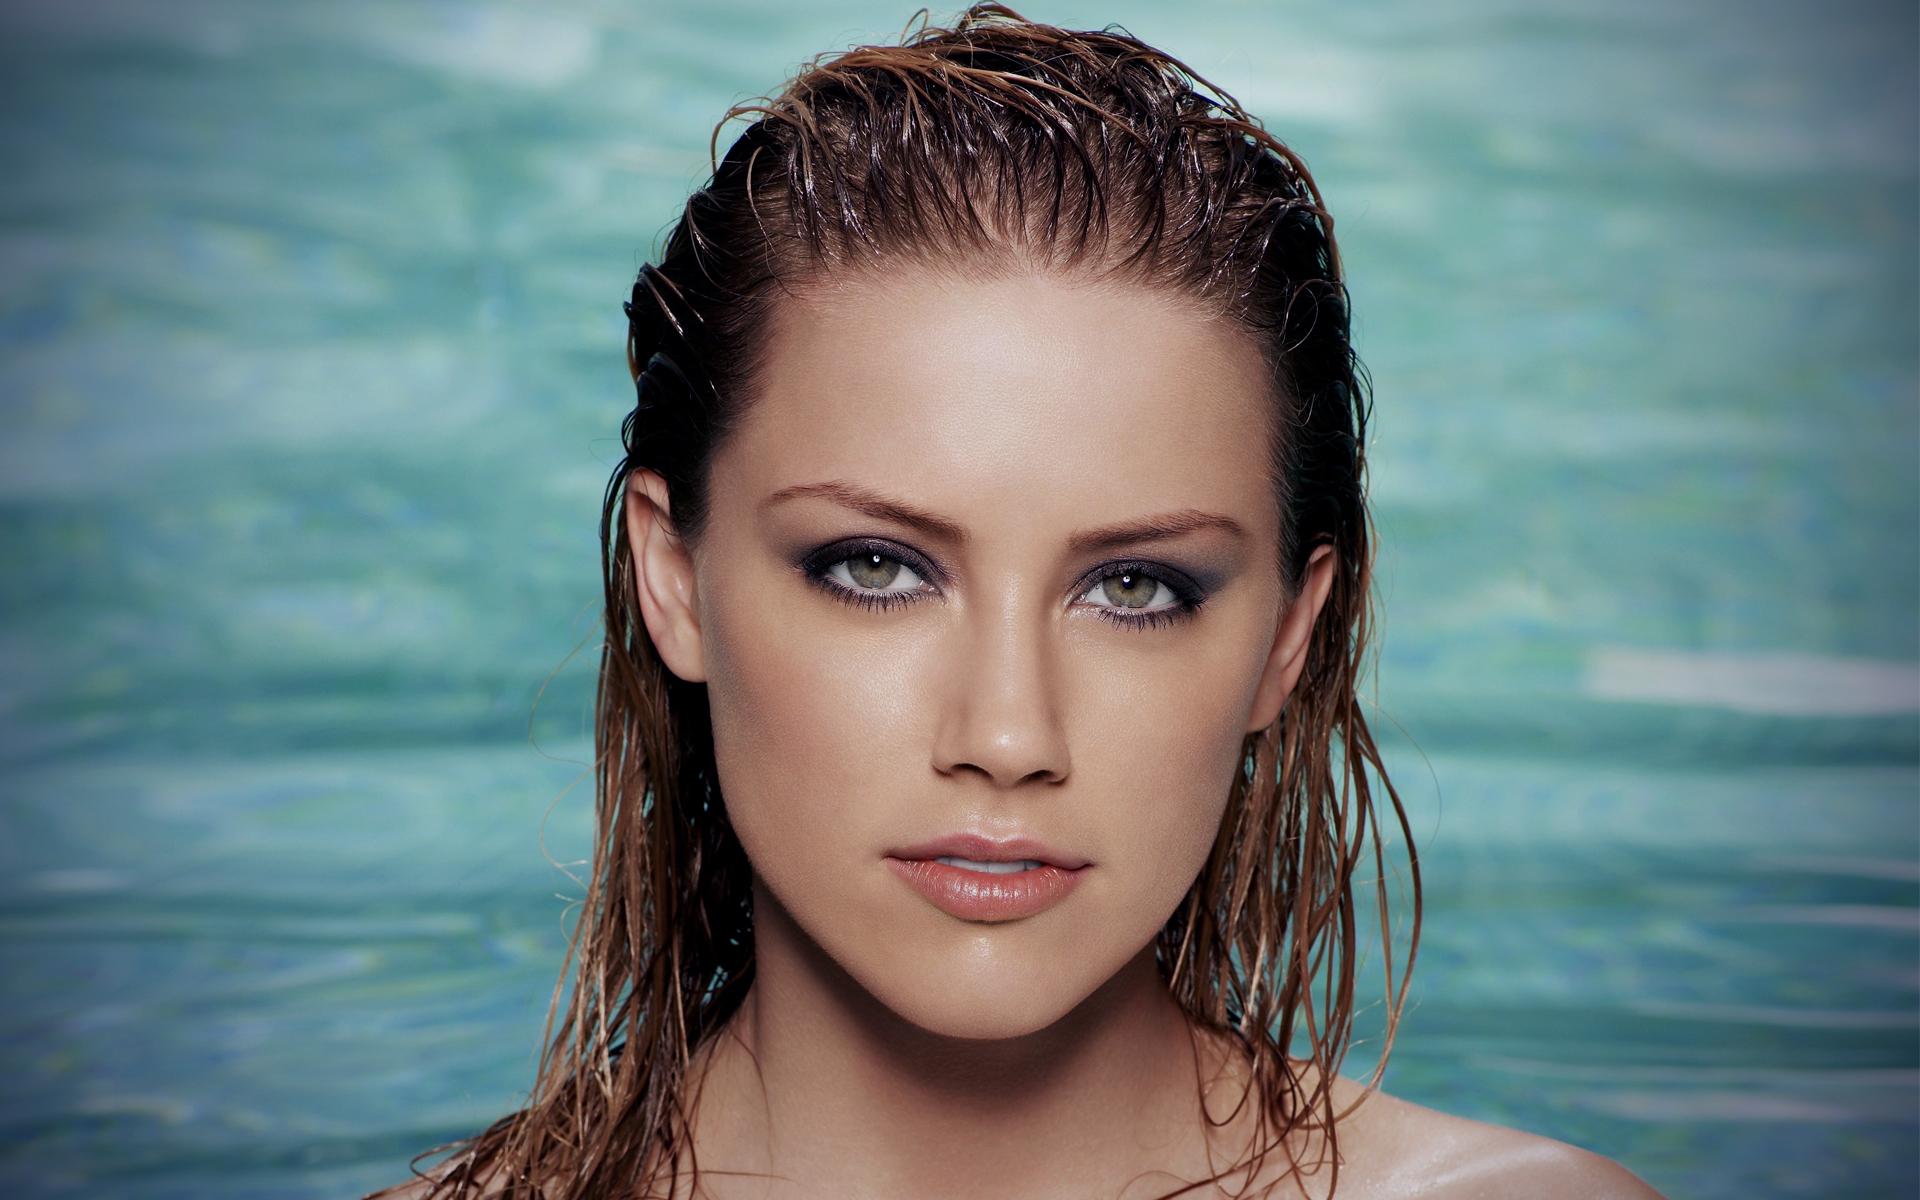 Amber Heard Hd: 20 Gorgeous HD Amber Heard Wallpapers